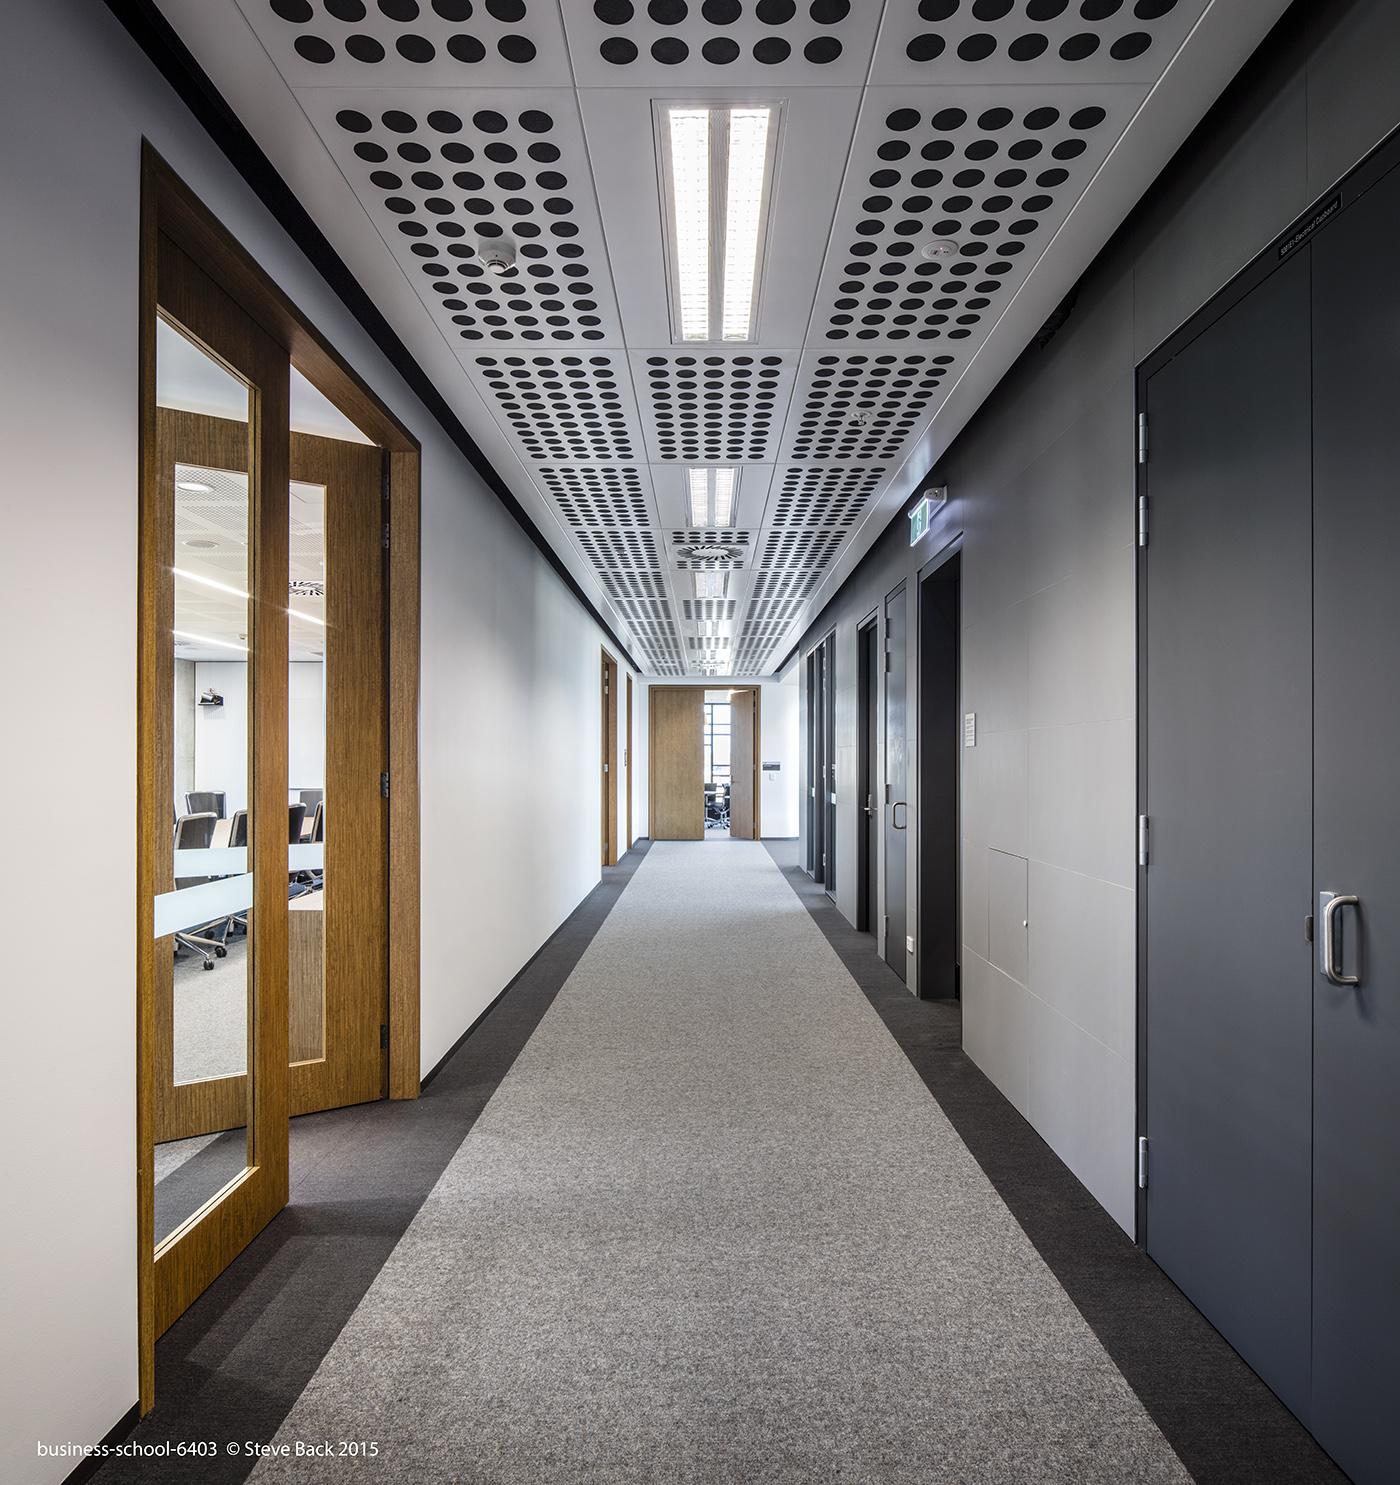 business-school-6403.jpg